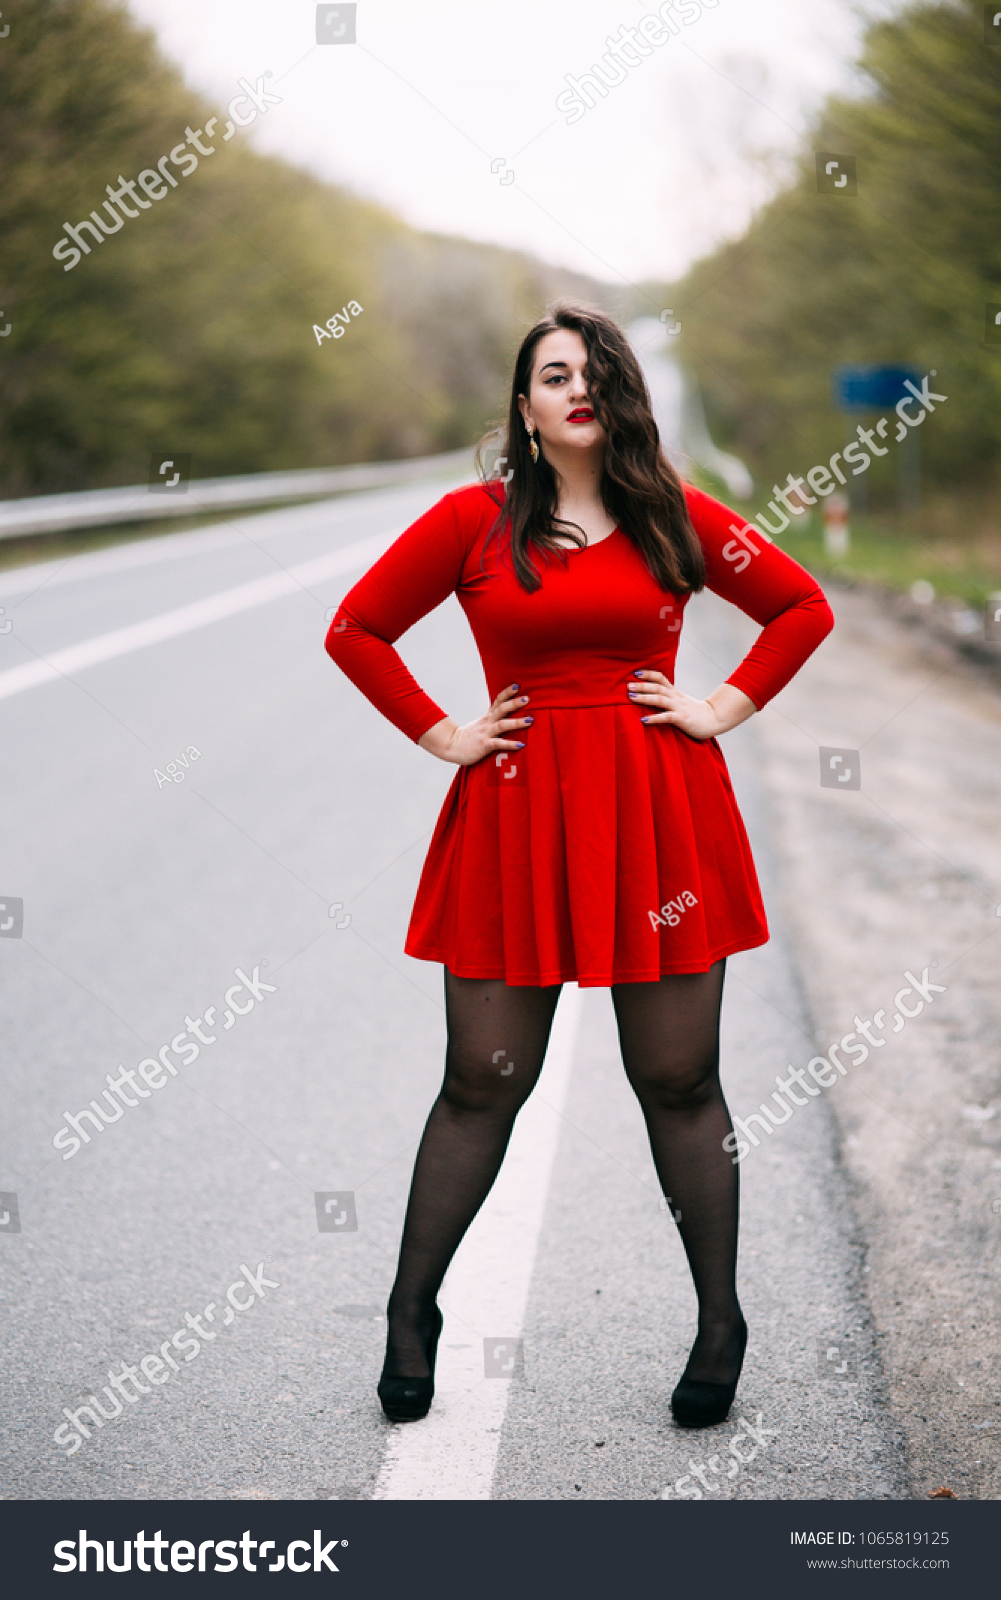 Young Stylish Woman Wearing Red Dress Stock Photo (Edit Now ... 2f39142e49e